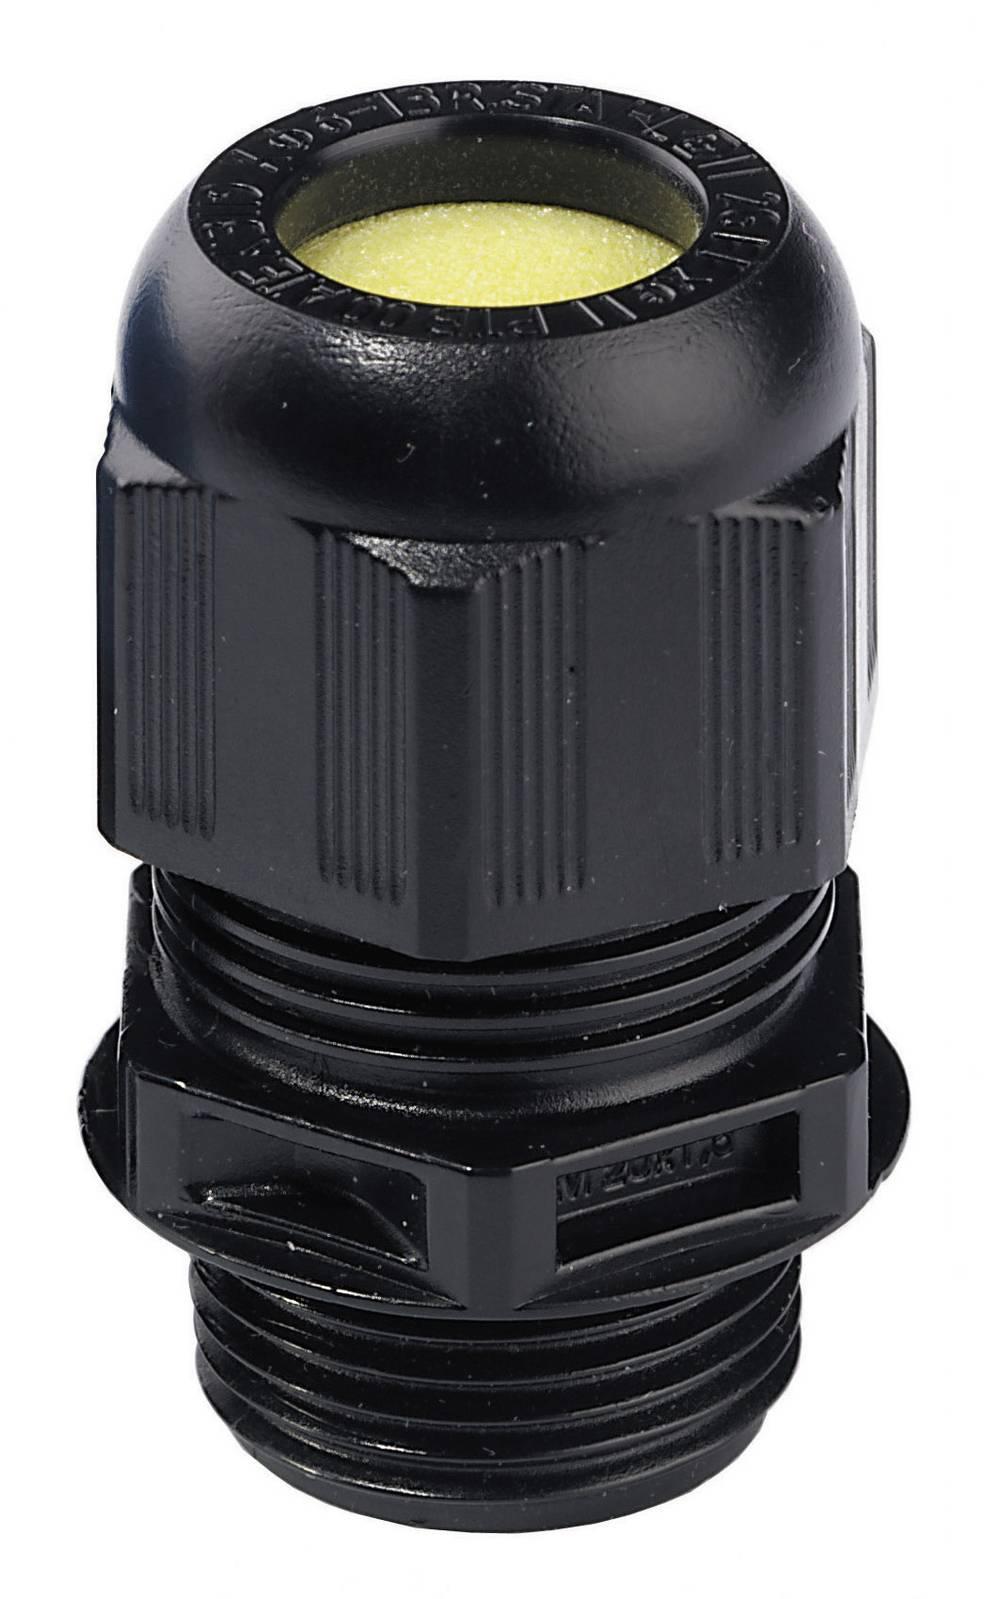 Kabelforskruning Wiska ESKE/1-L-e 25 M25 Sort (RAL 9005) 1 stk